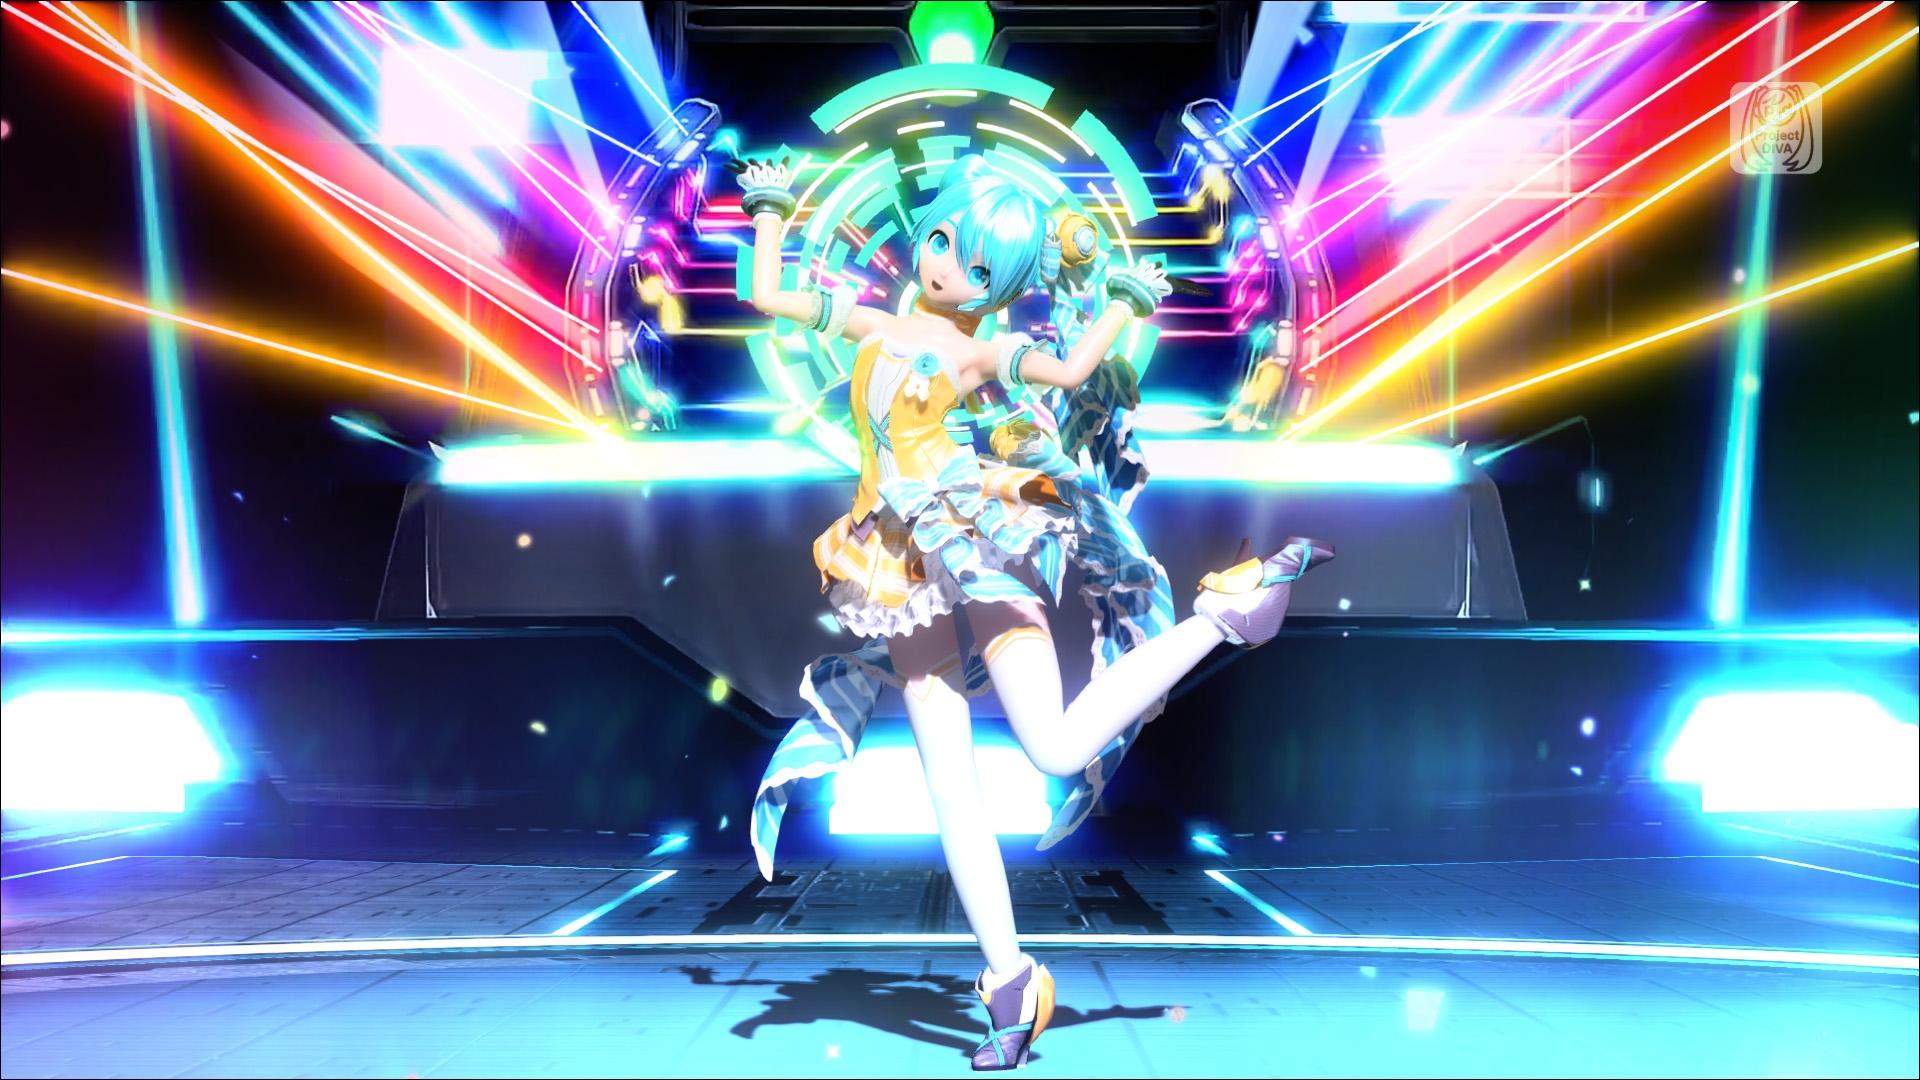 Hatsune miku project diva future tone japanese release - Hatsune miku project diva future ...